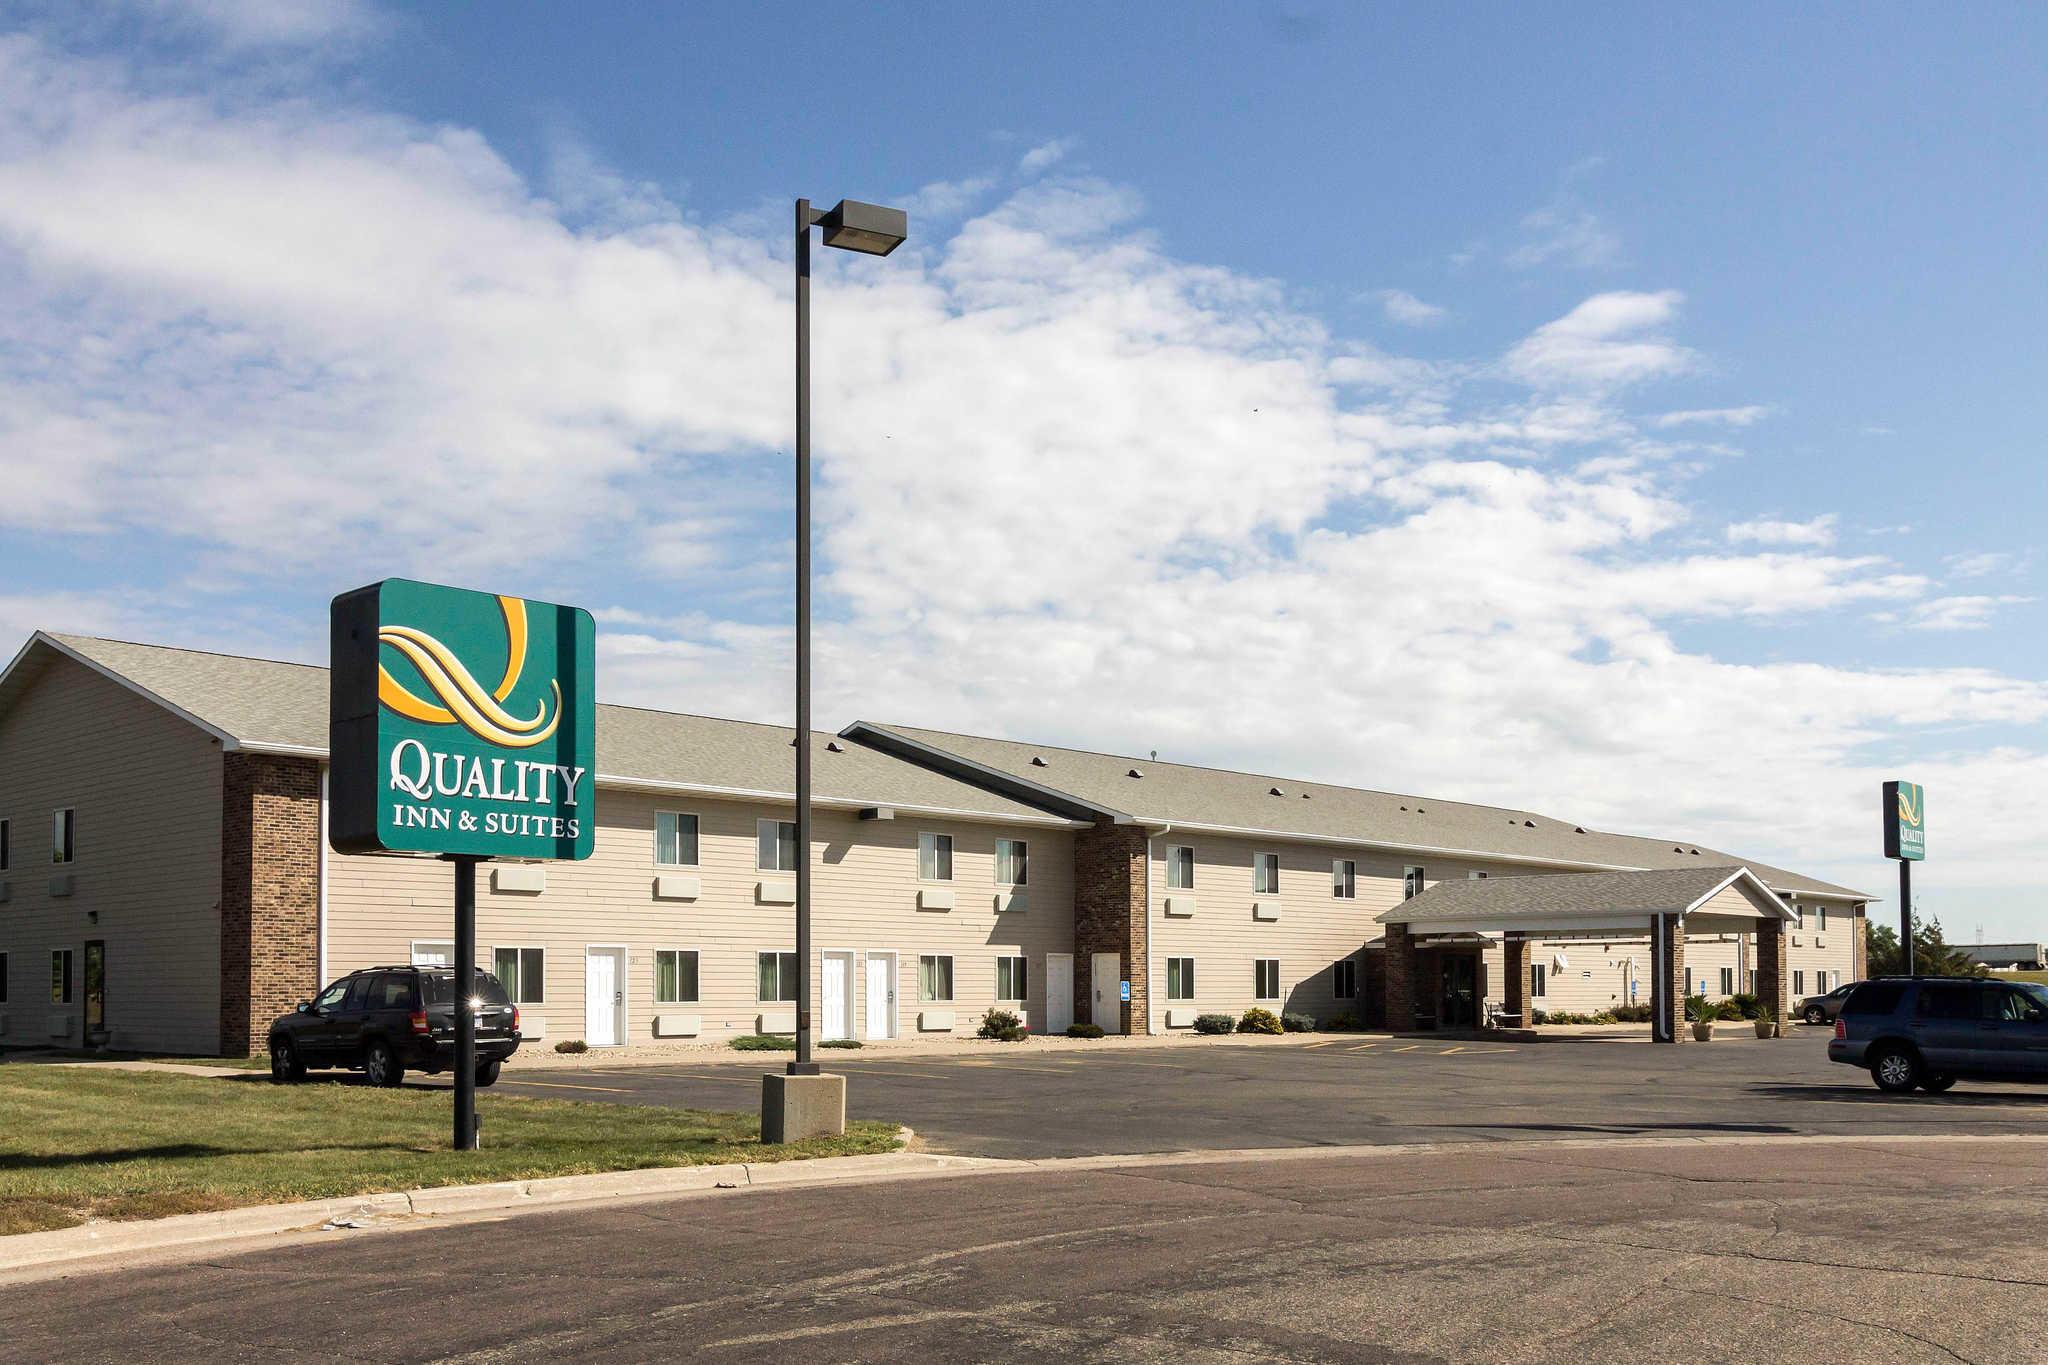 Quality Inn & Suites image 2